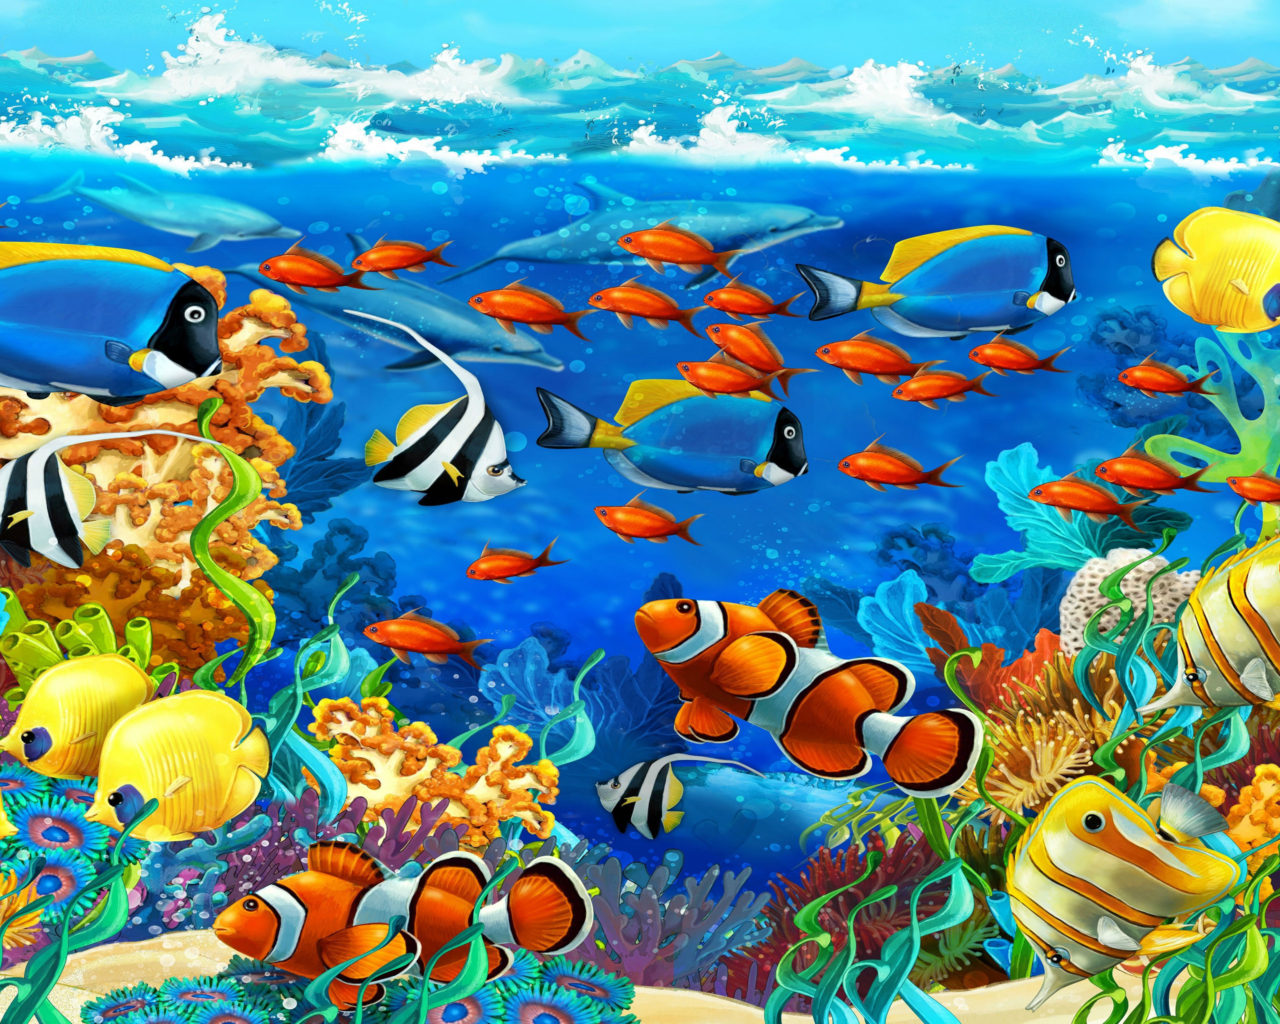 Free 3d Dinosaur Wallpaper Sea Underwater World Coral Exotic Tropical Fish